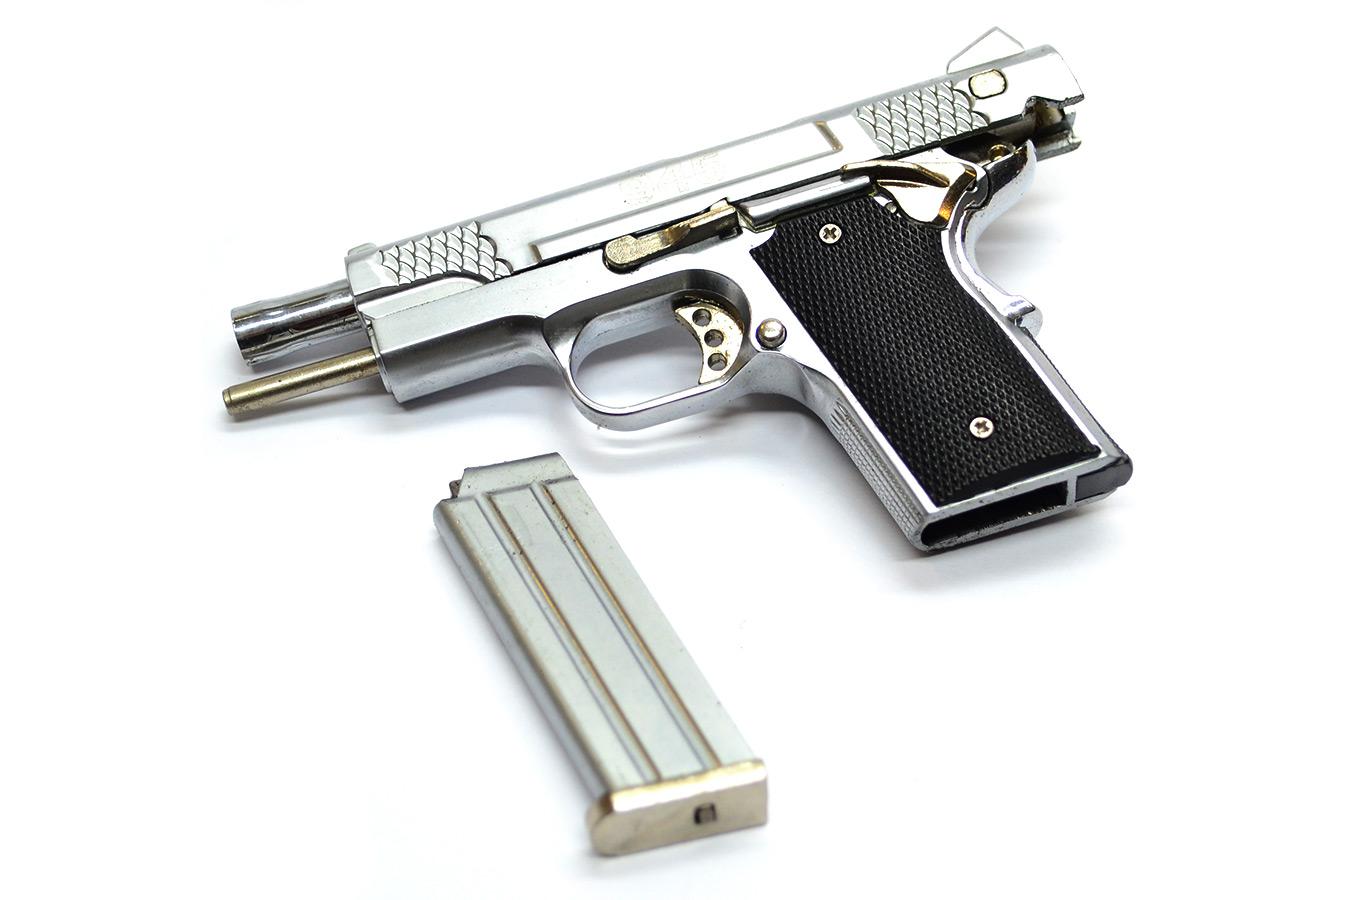 Макет пистолета Smith & Wesson Model 945 в масштабе 1:2